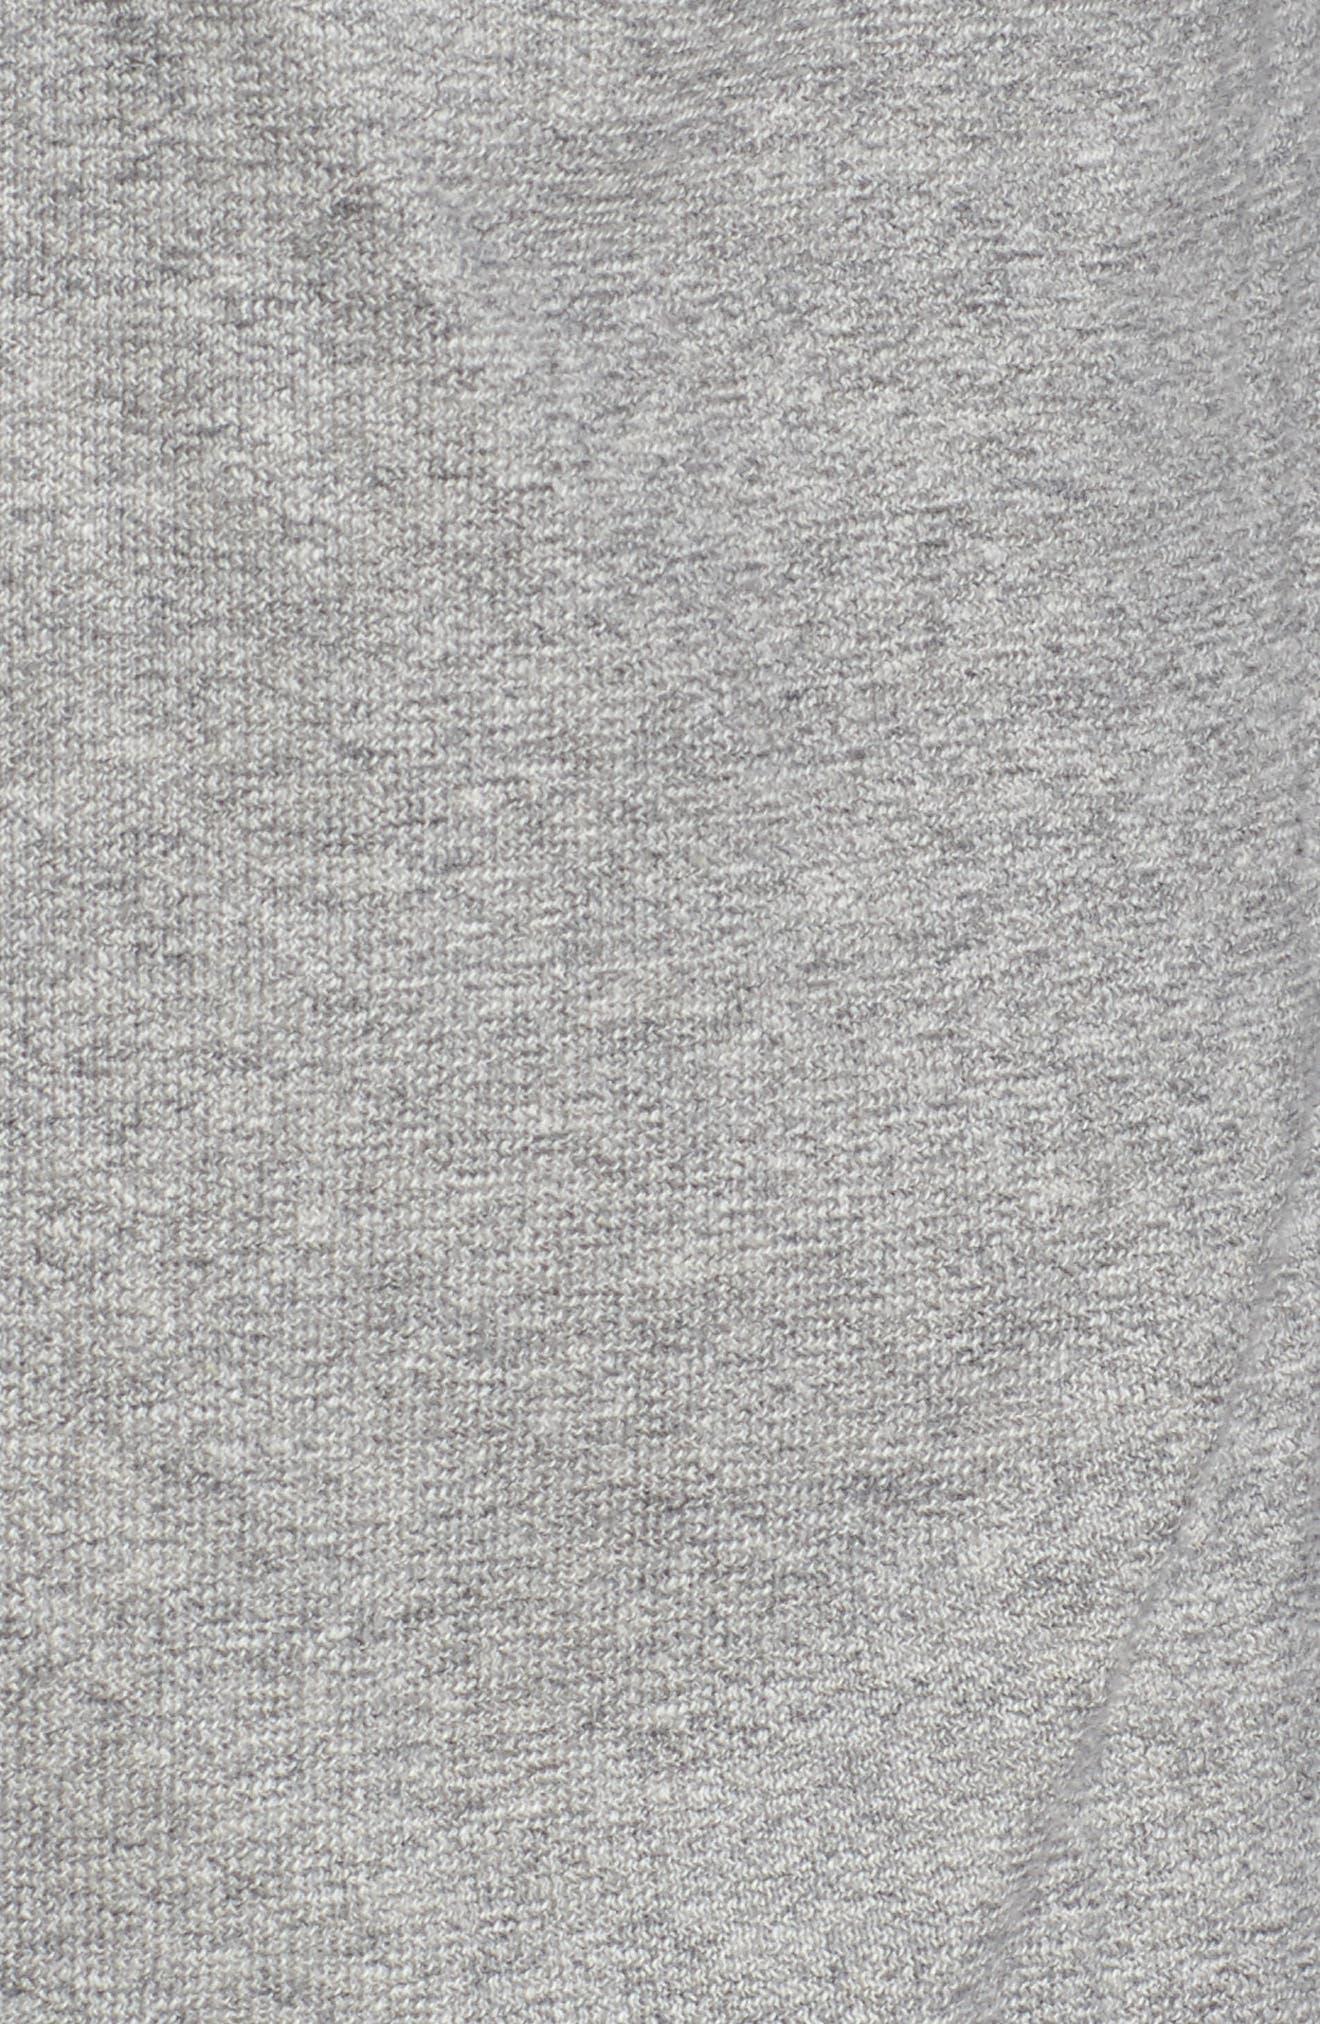 Alternate Image 5  - Nordstrom Men's Shop Trim Fit Knit Sport Shirt (Tall)